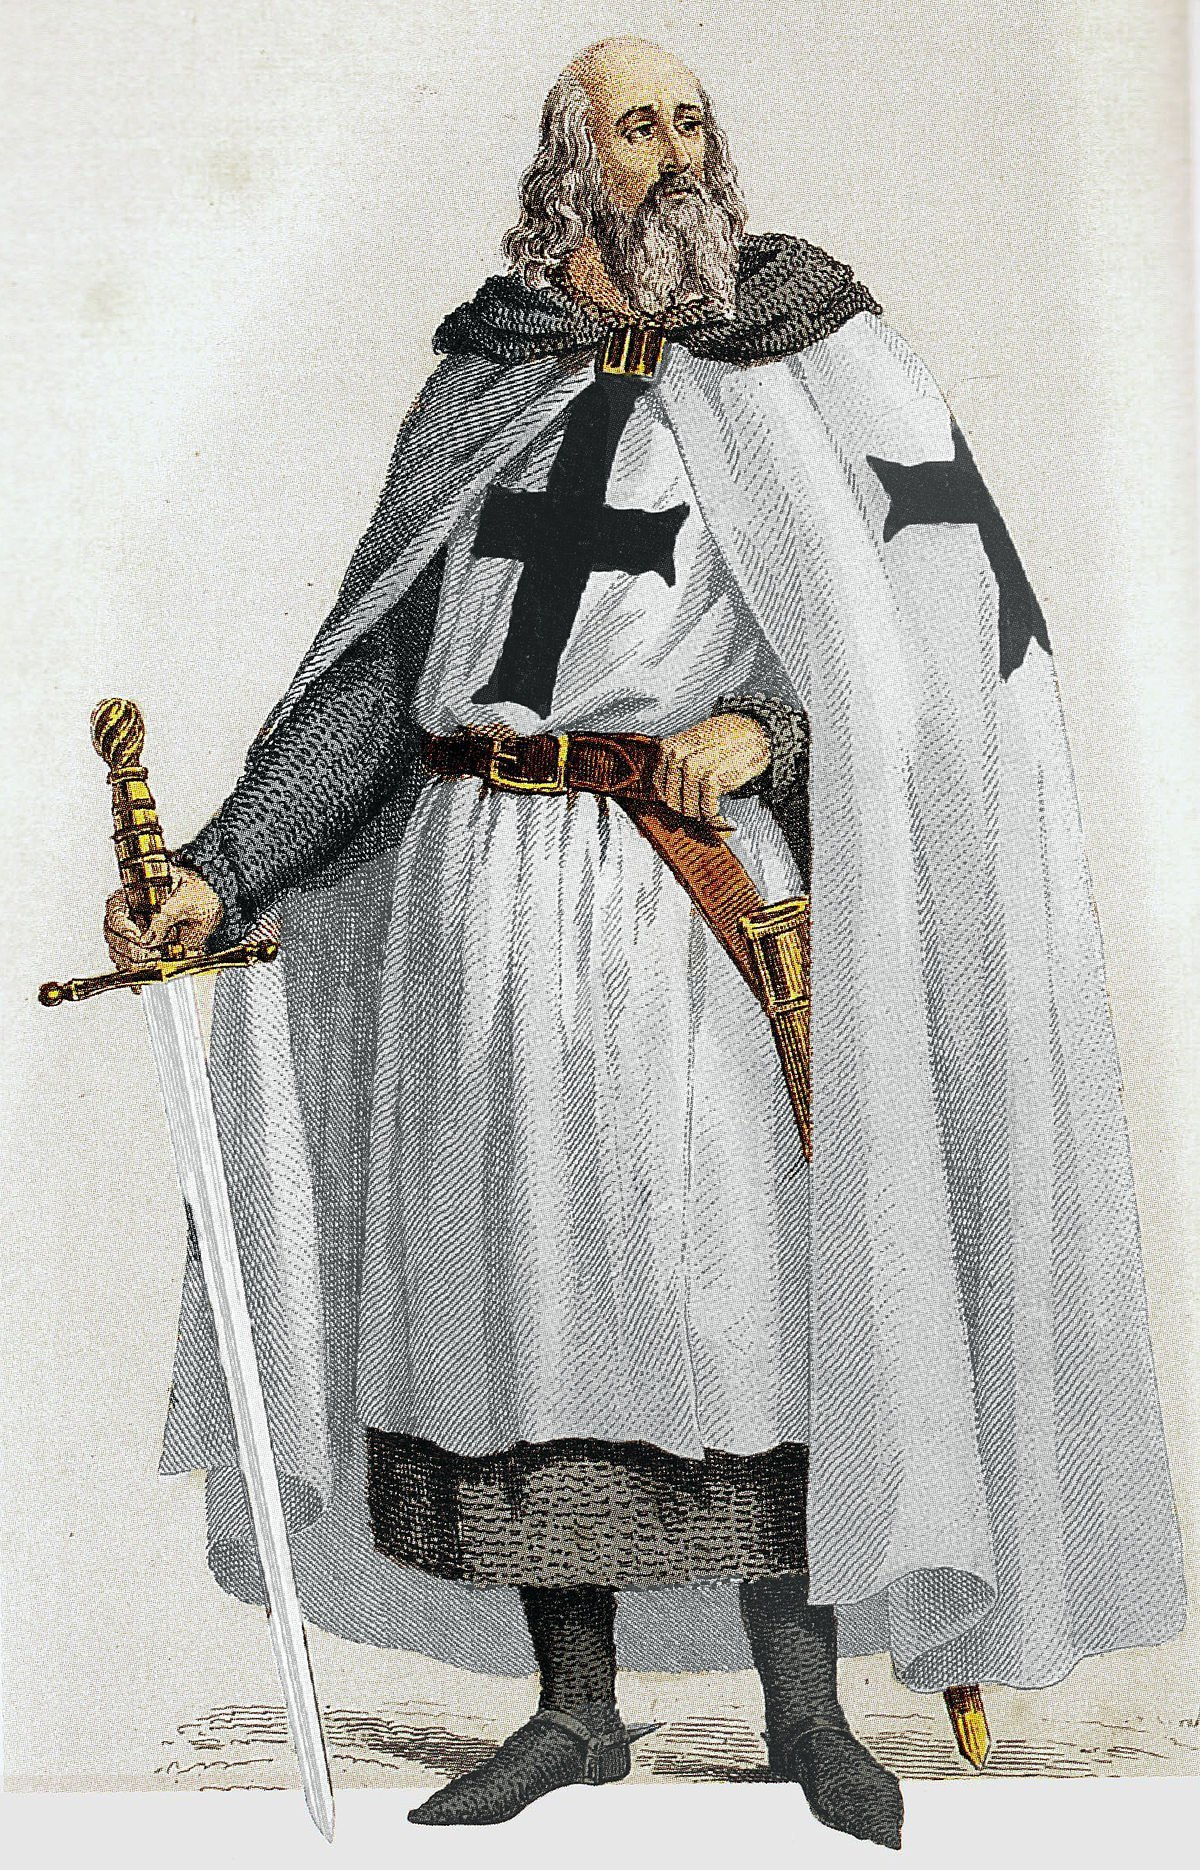 Jacques de Molay - Wikipedia